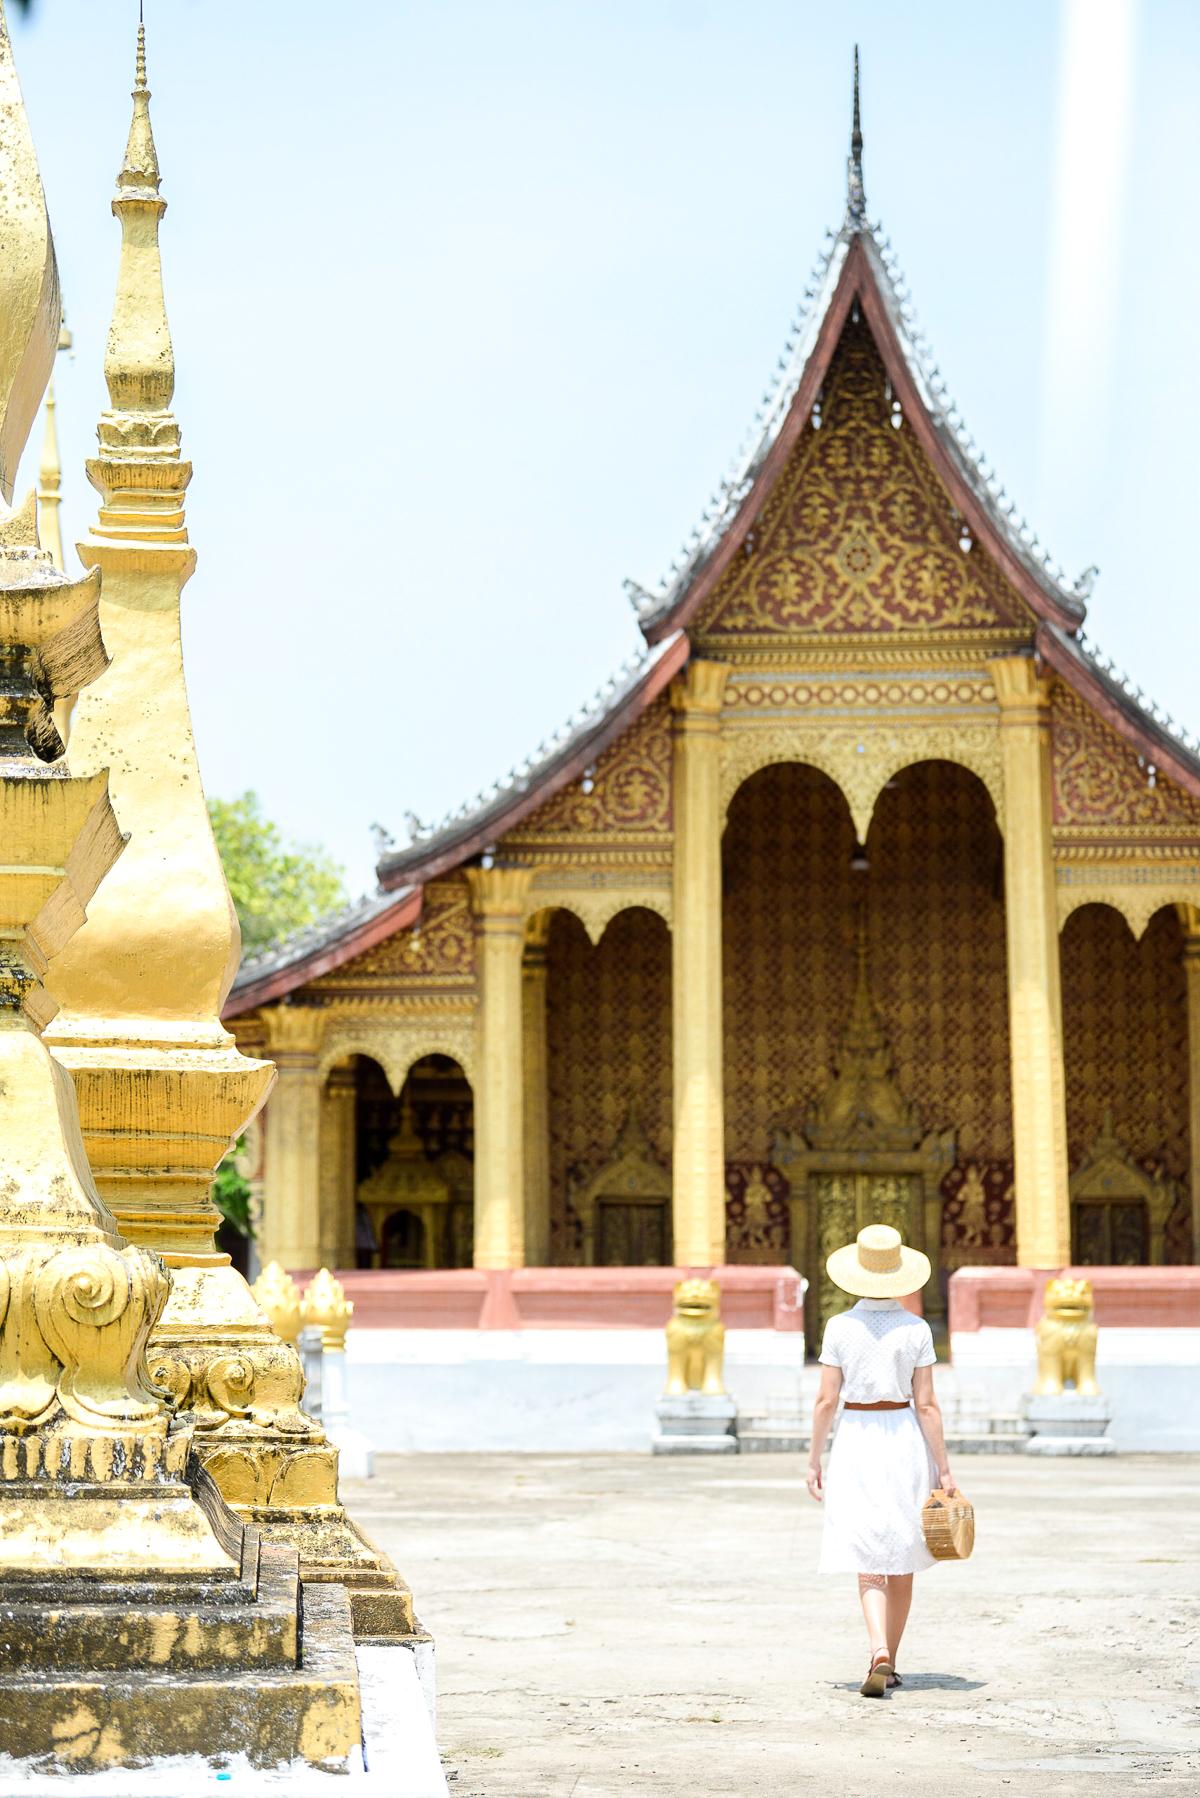 Stacie Flinner 3 Nagas Complete Guide to Luang Prabang-154.jpg